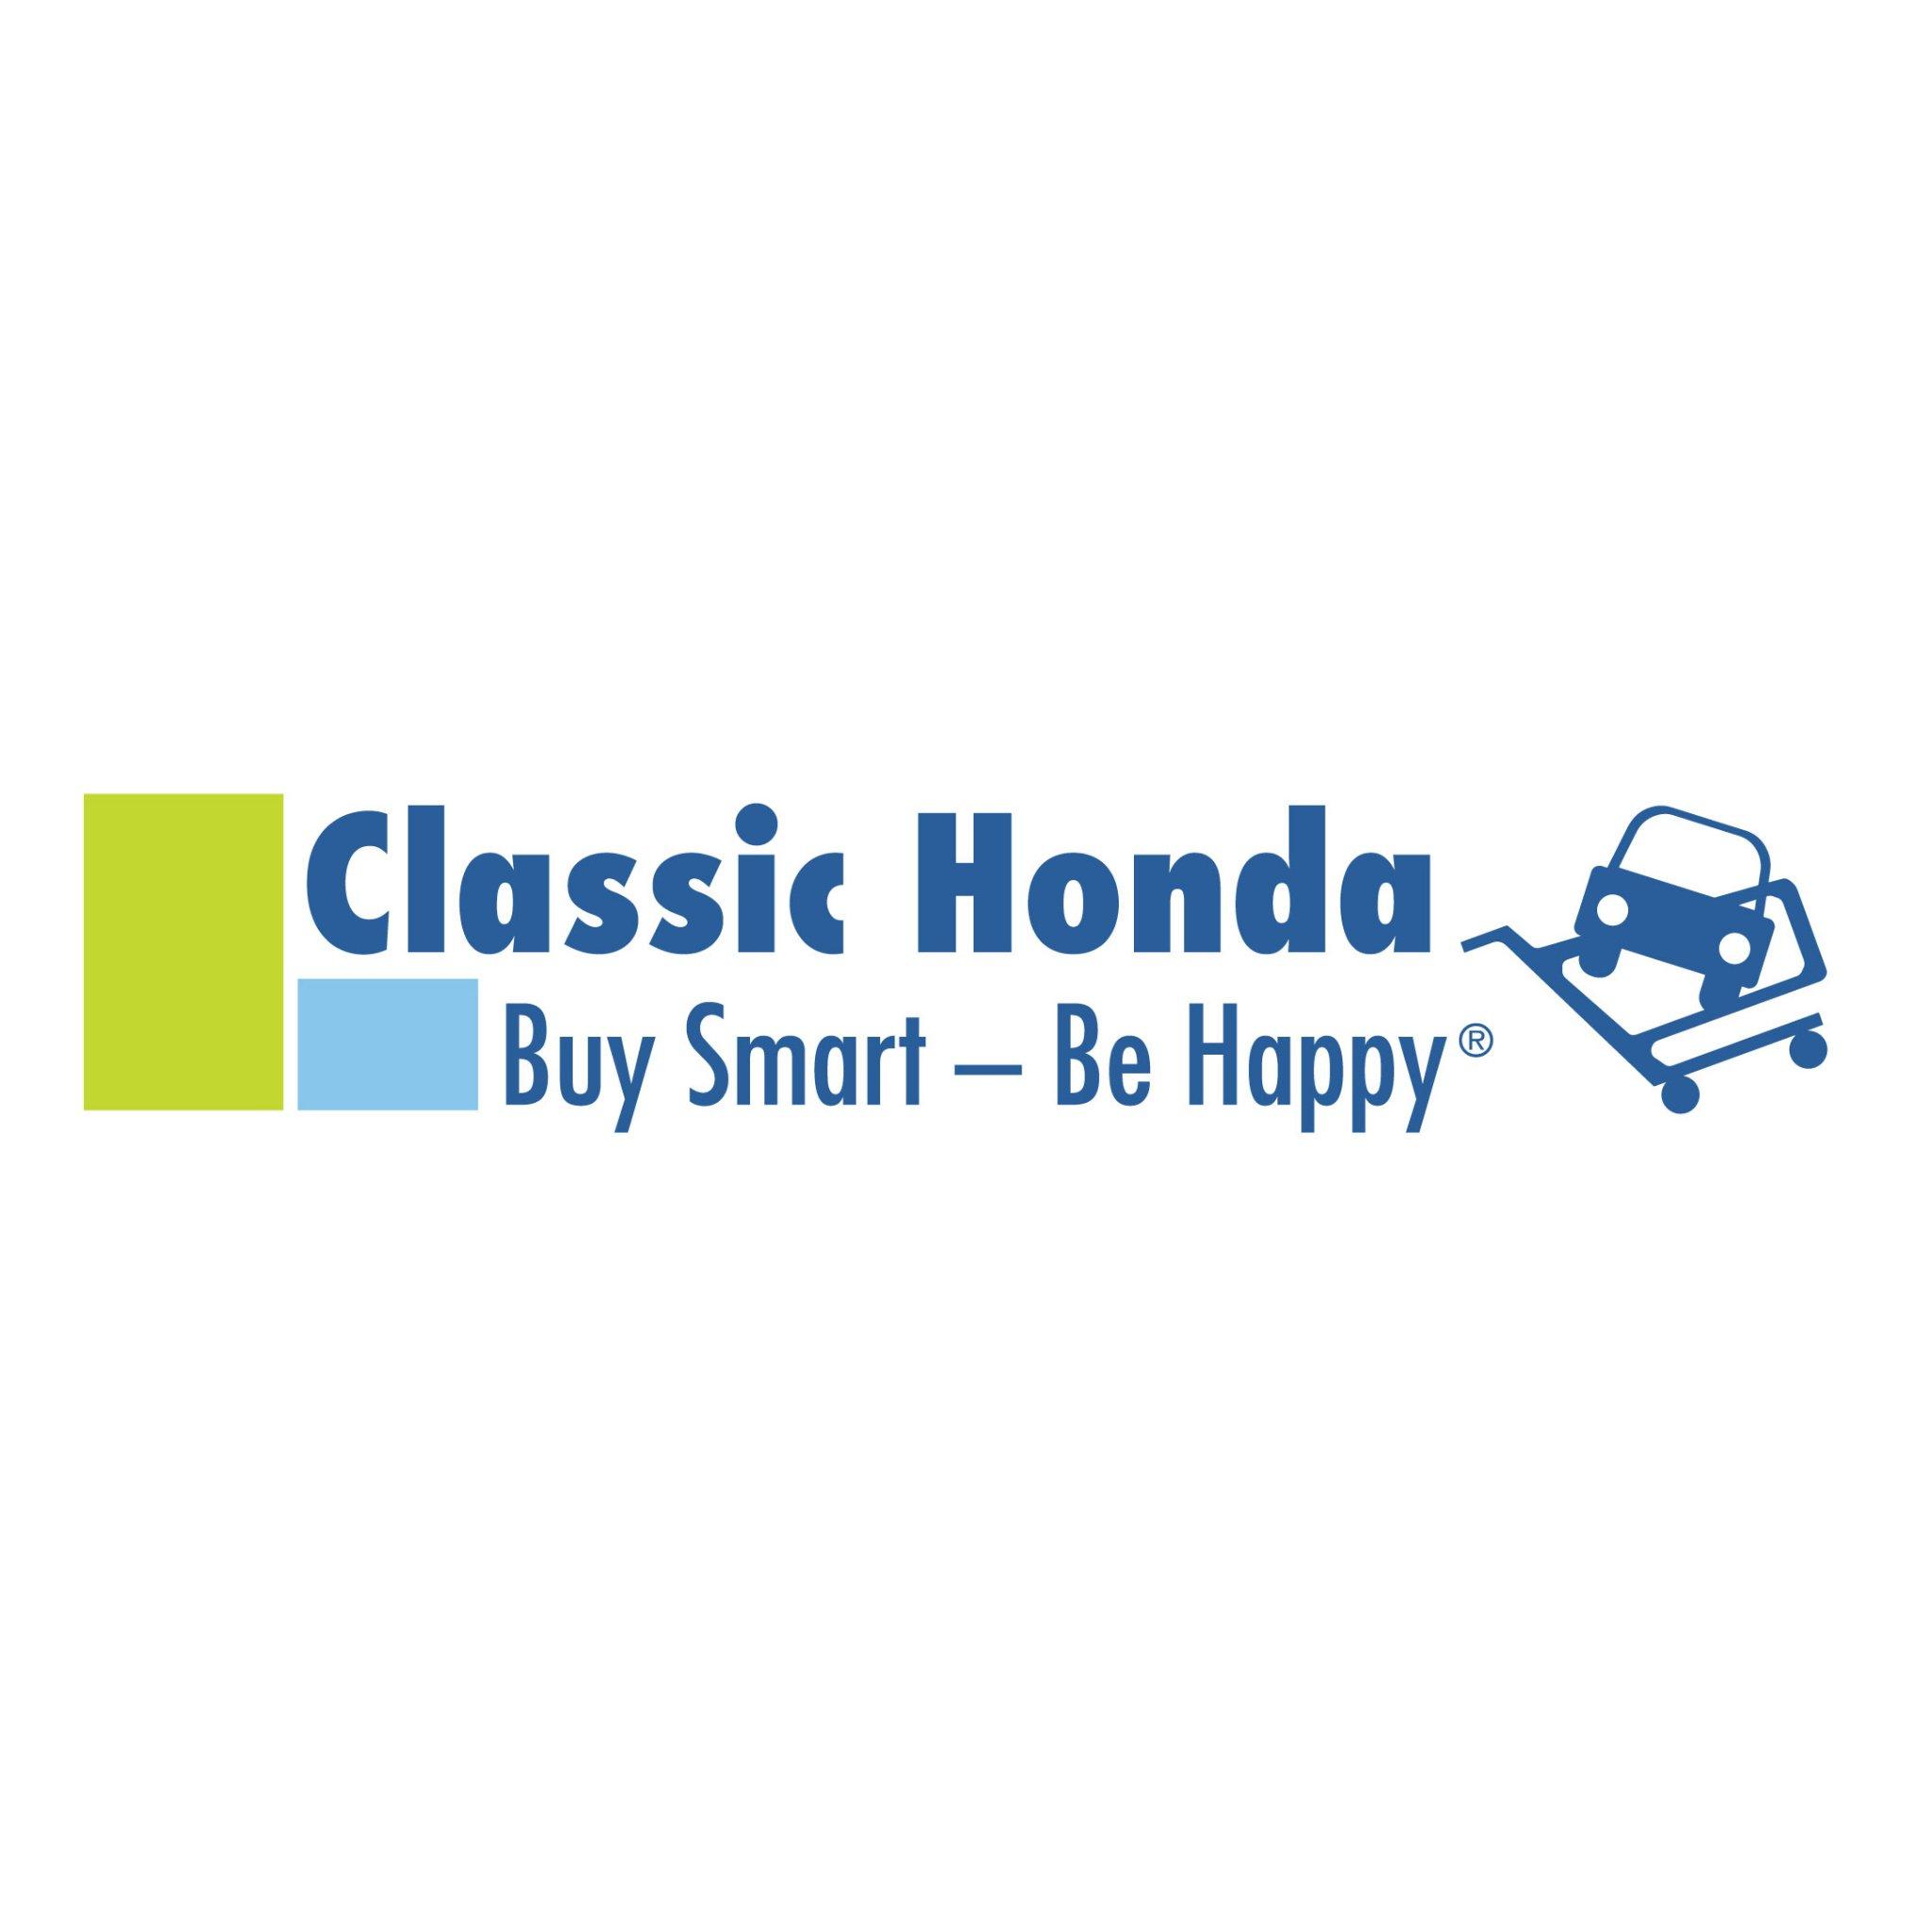 classic honda classichonda twitter classic honda classichonda twitter